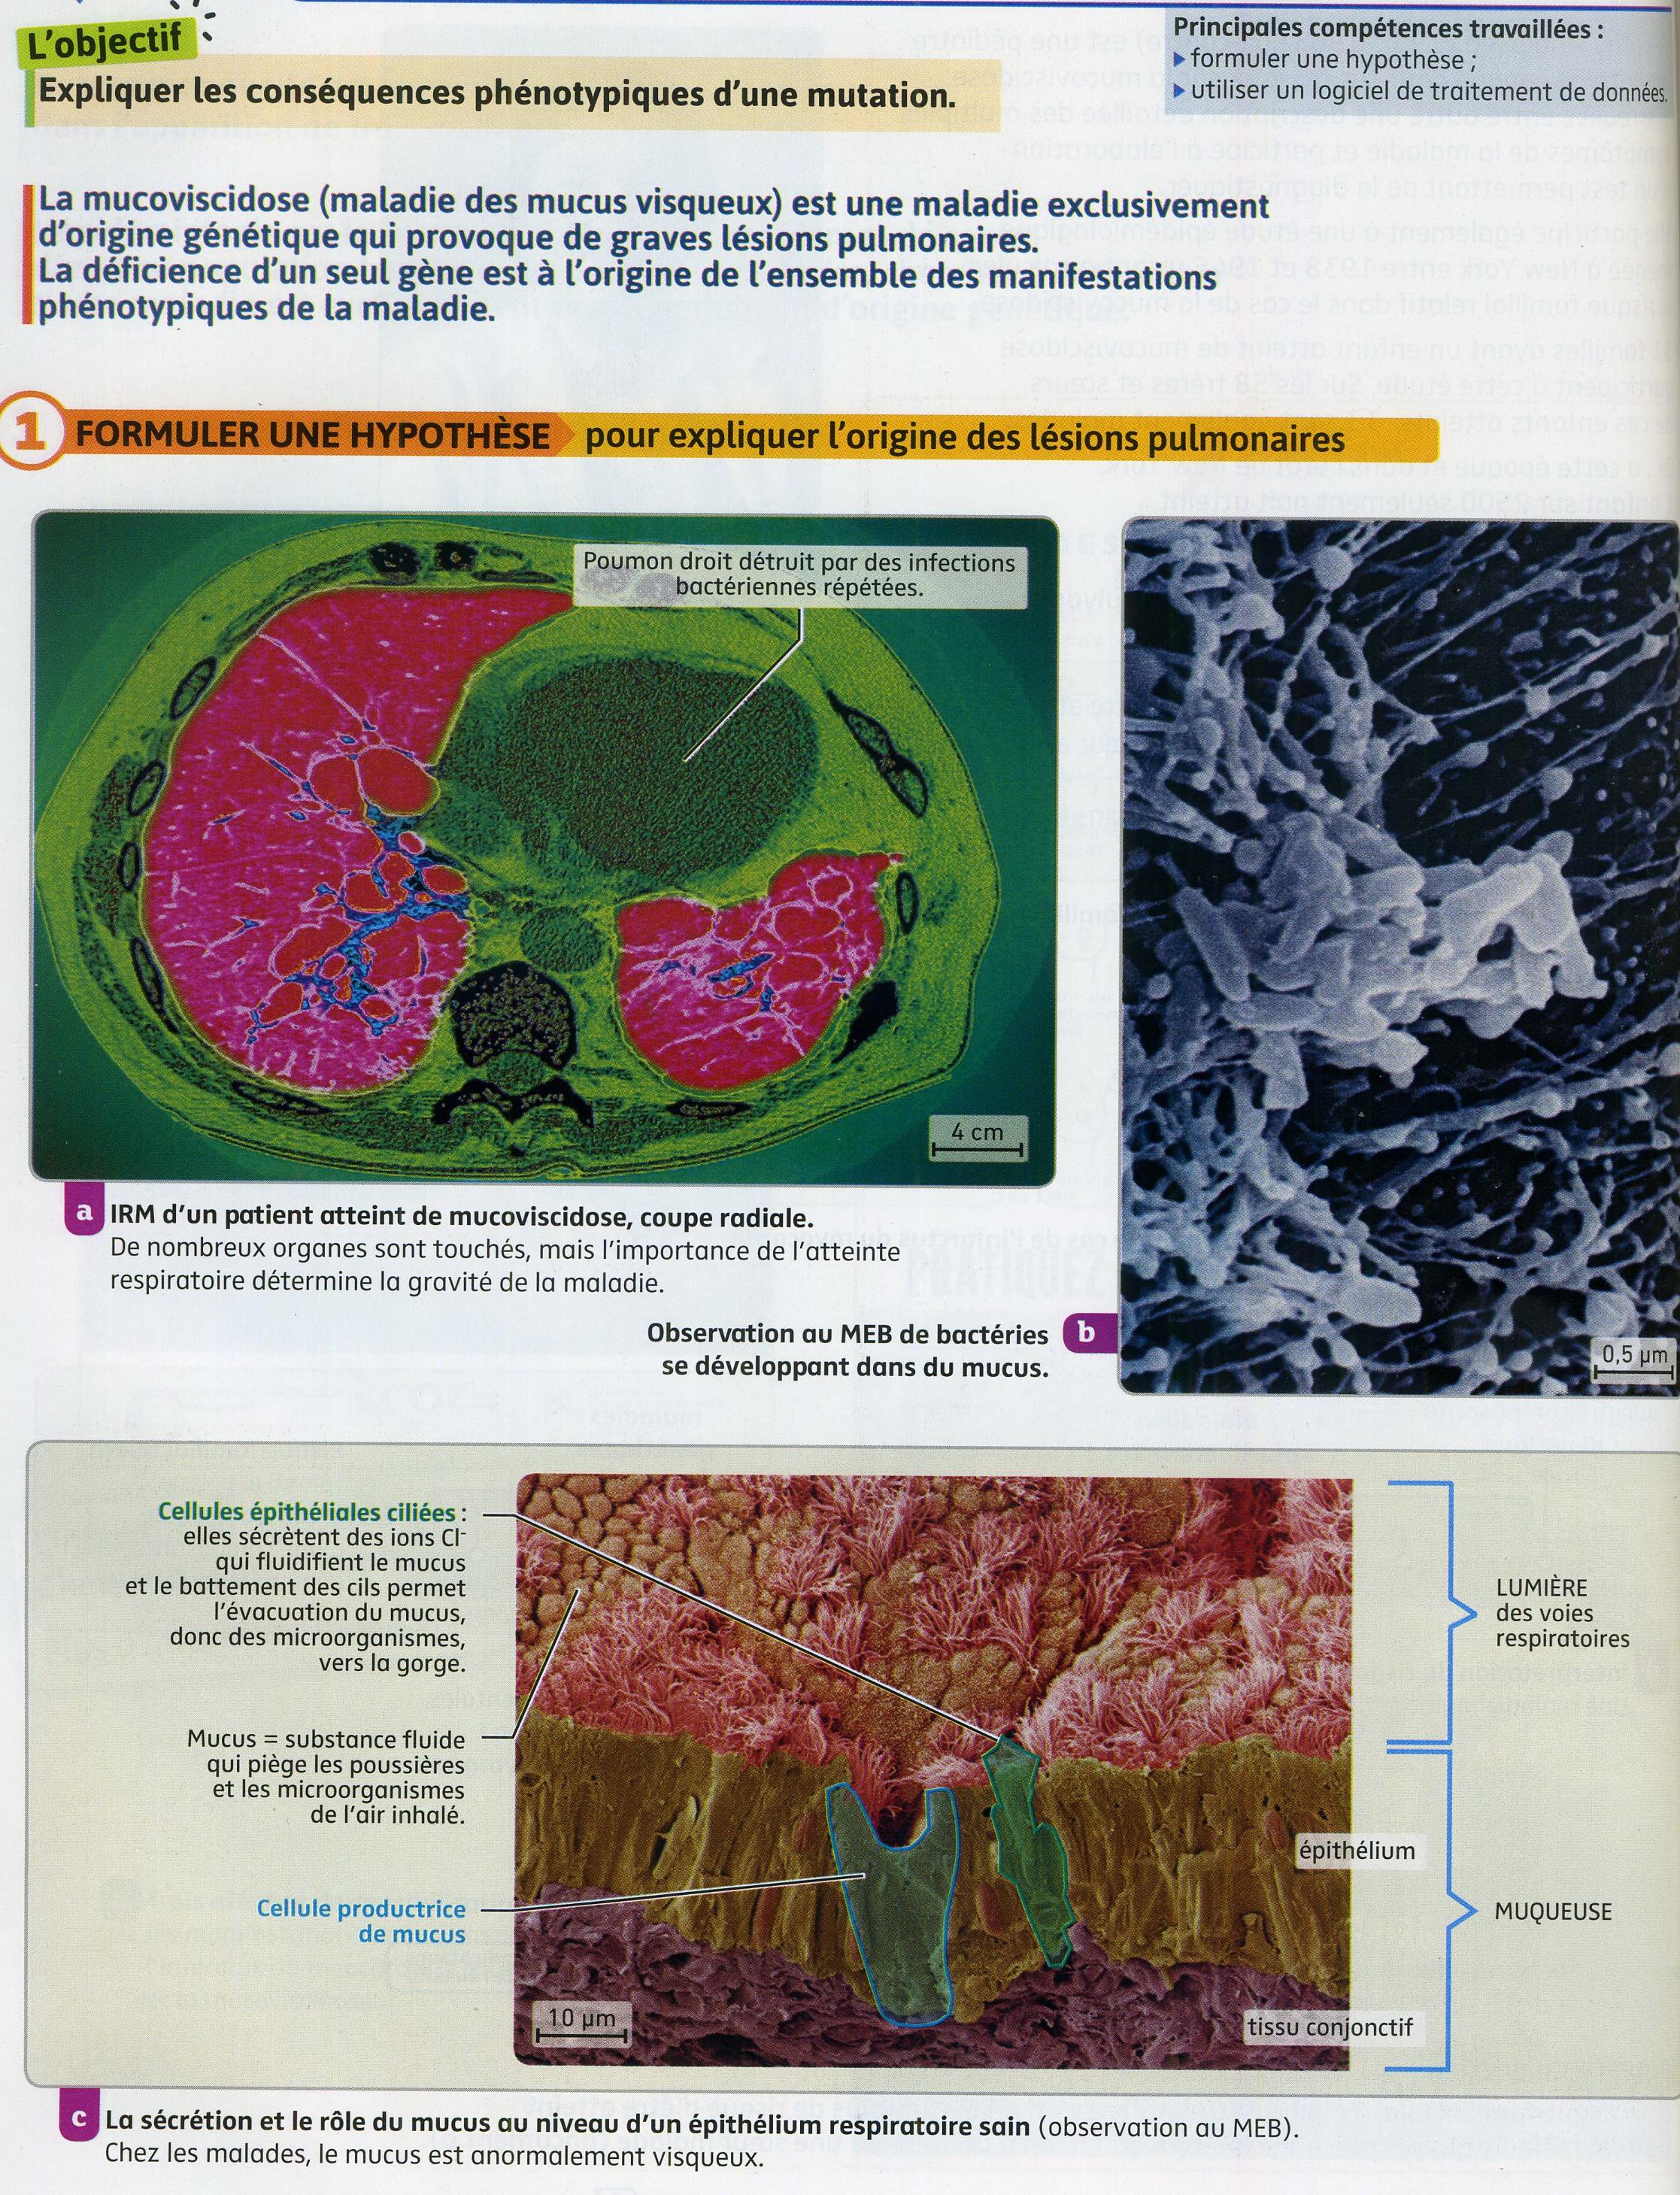 Mucoviscidose_activité 3_(1)